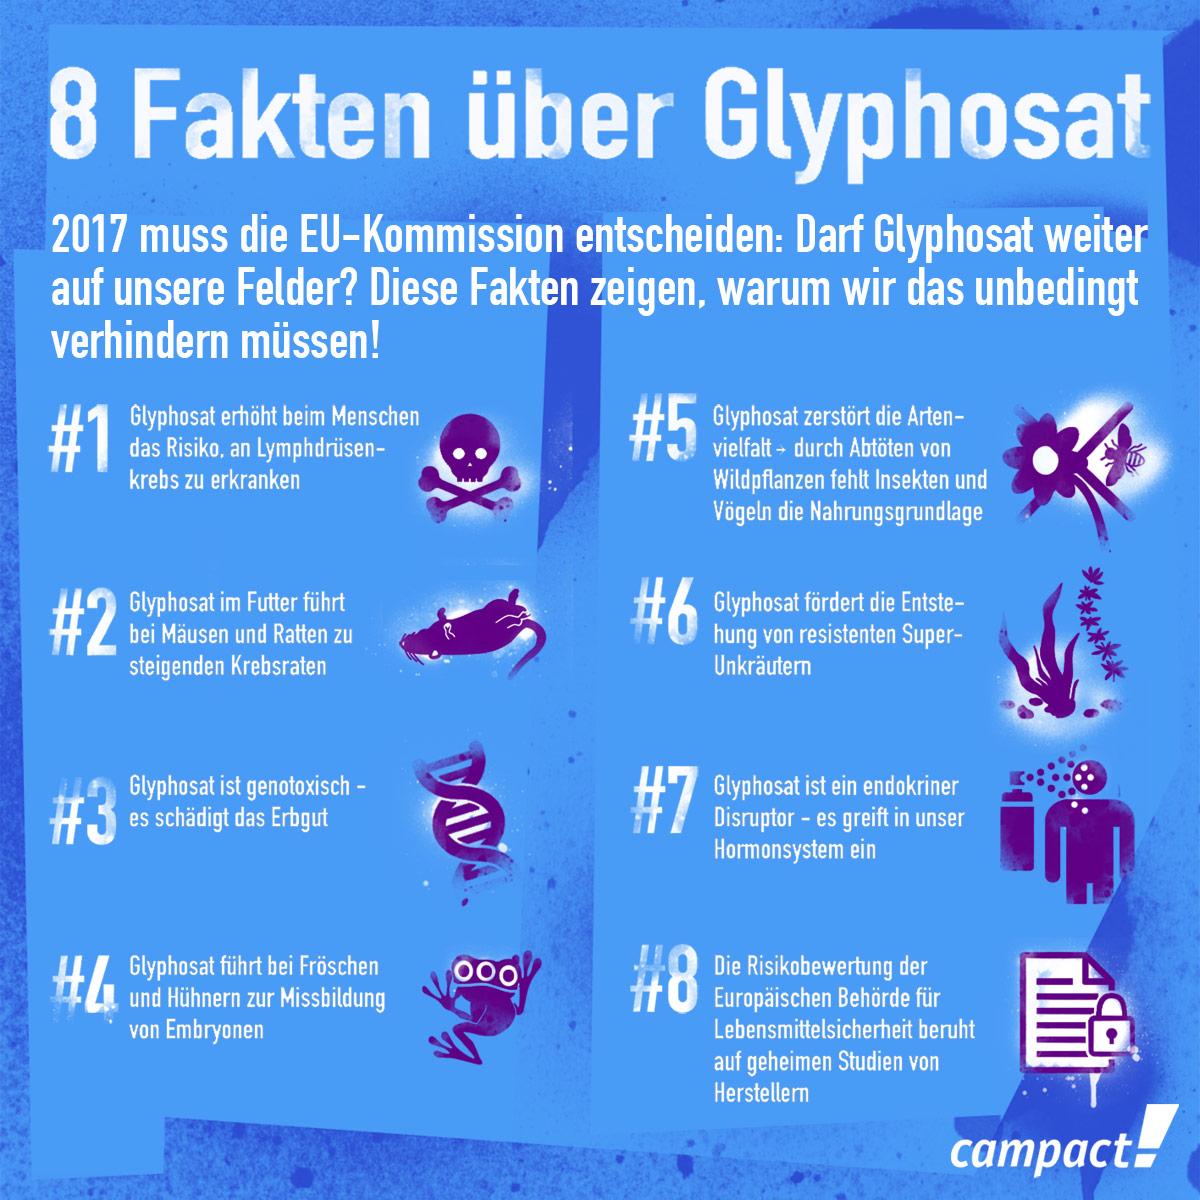 8 Fakten über Glyphosat. Grafik: Zitrusblau/Campact